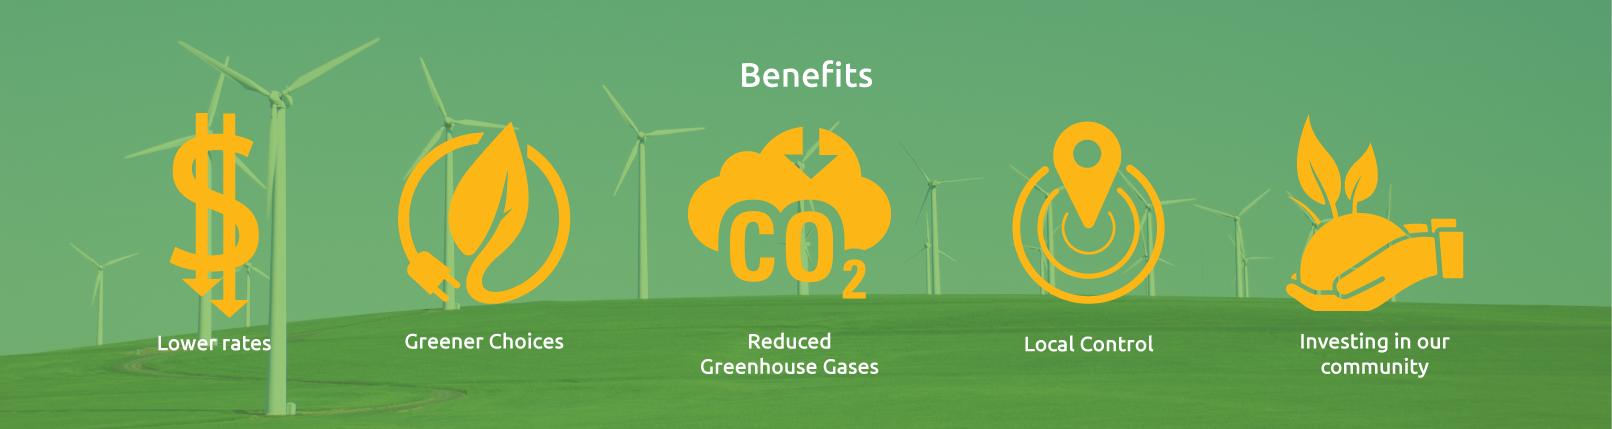 PCE benefits graphic